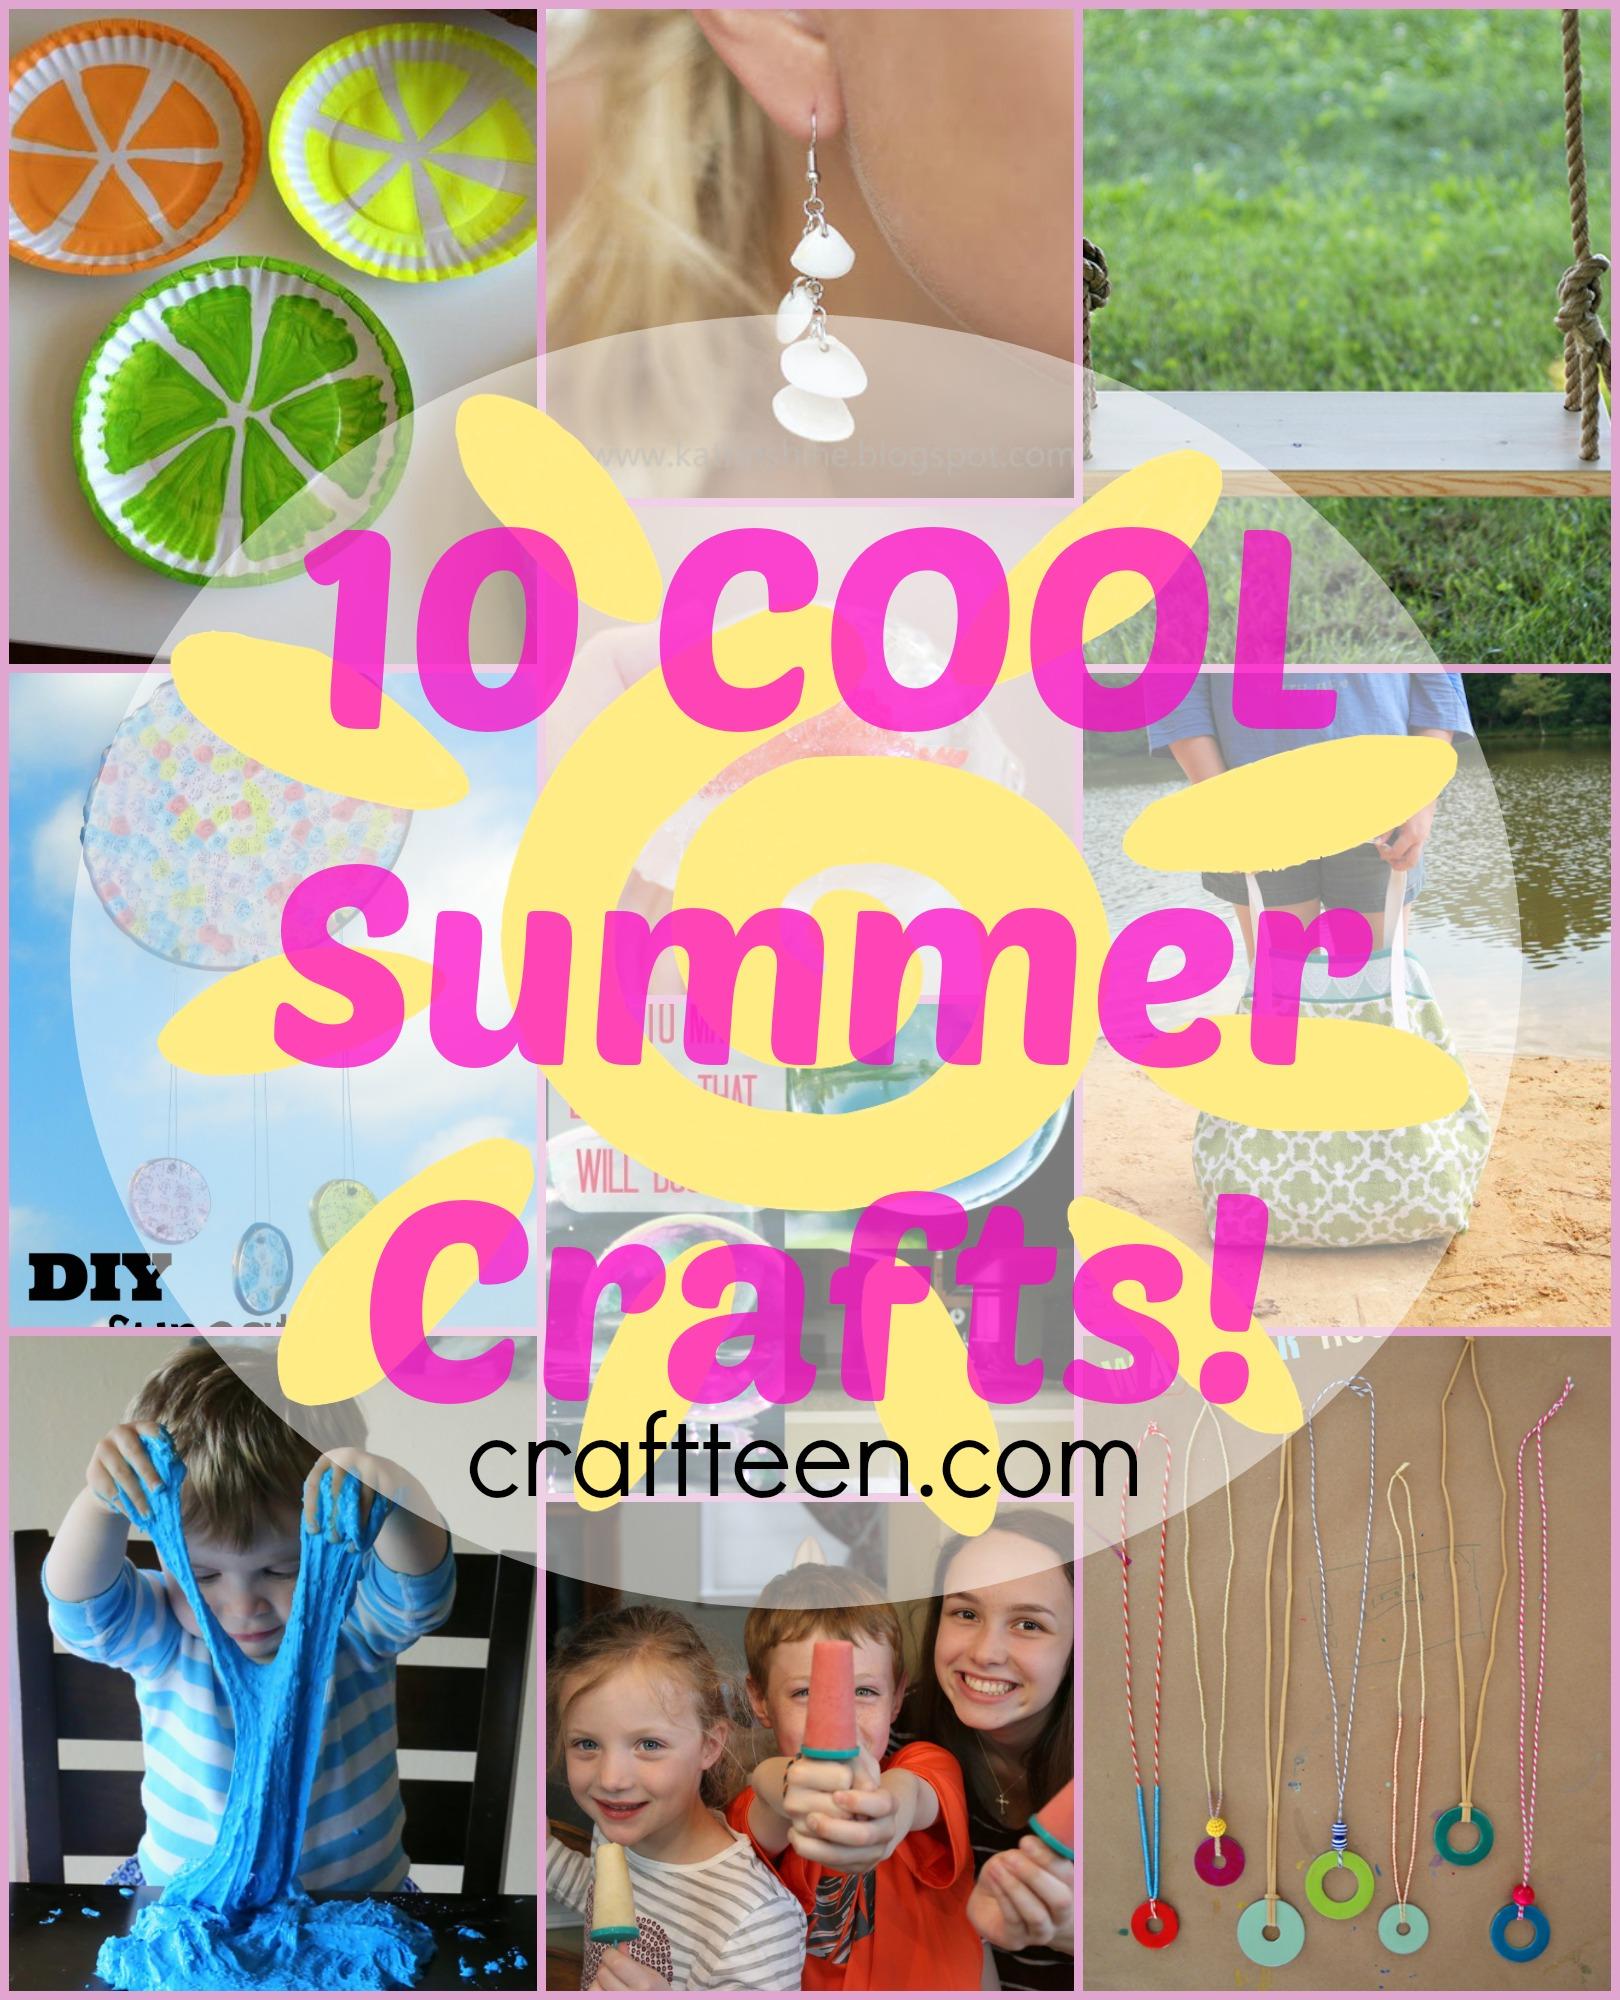 10_cool_Summer_crafts